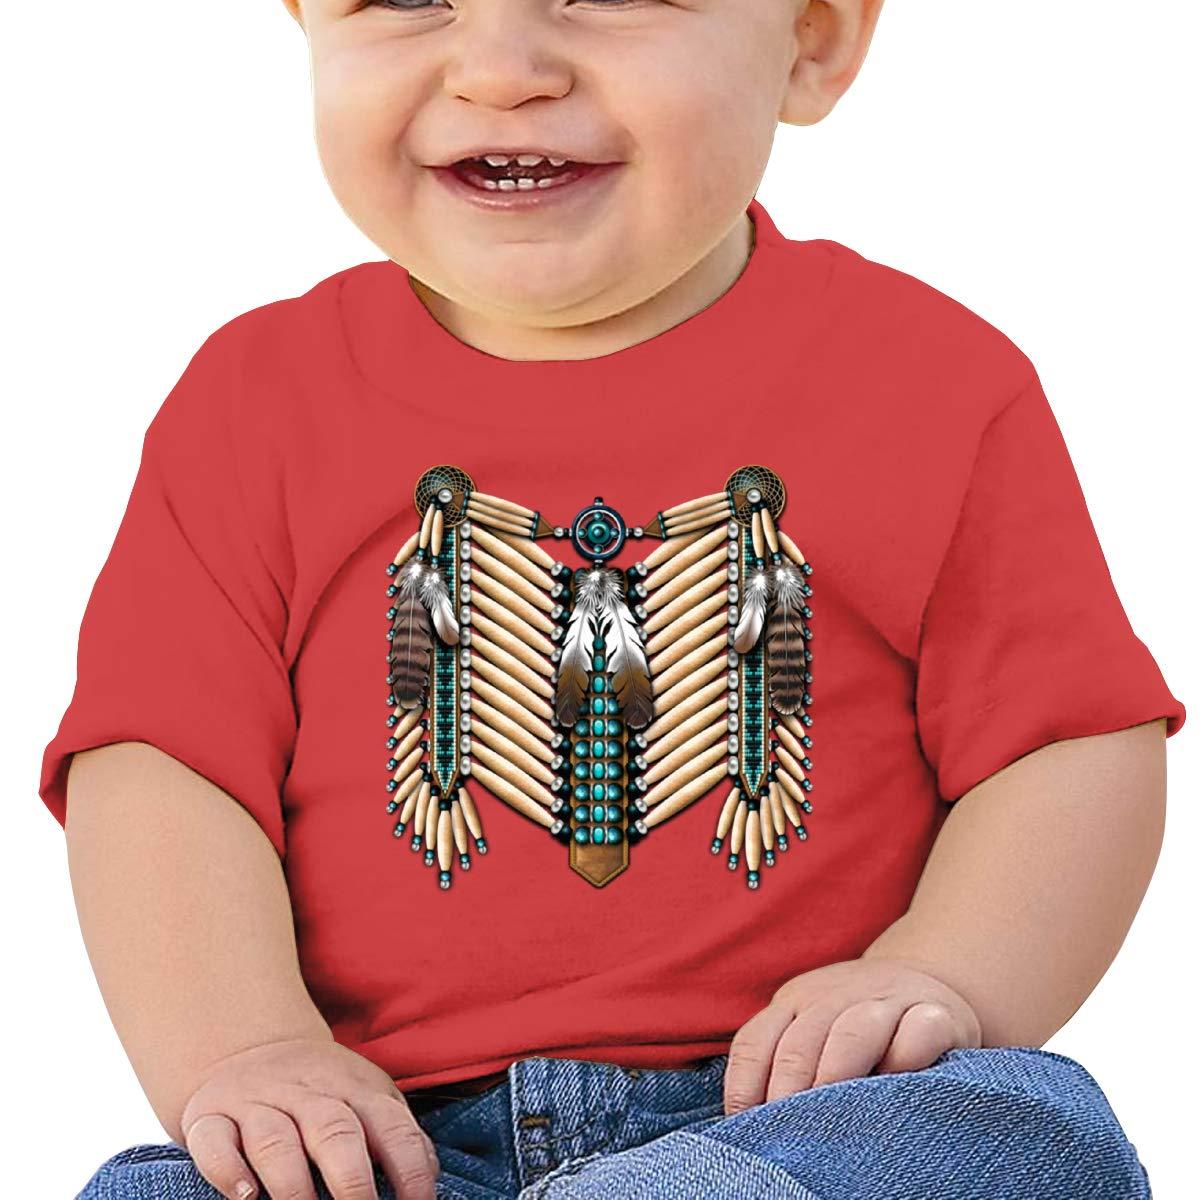 Native American Breastplate Short-Sleeve Tee Baby Boys Toddler